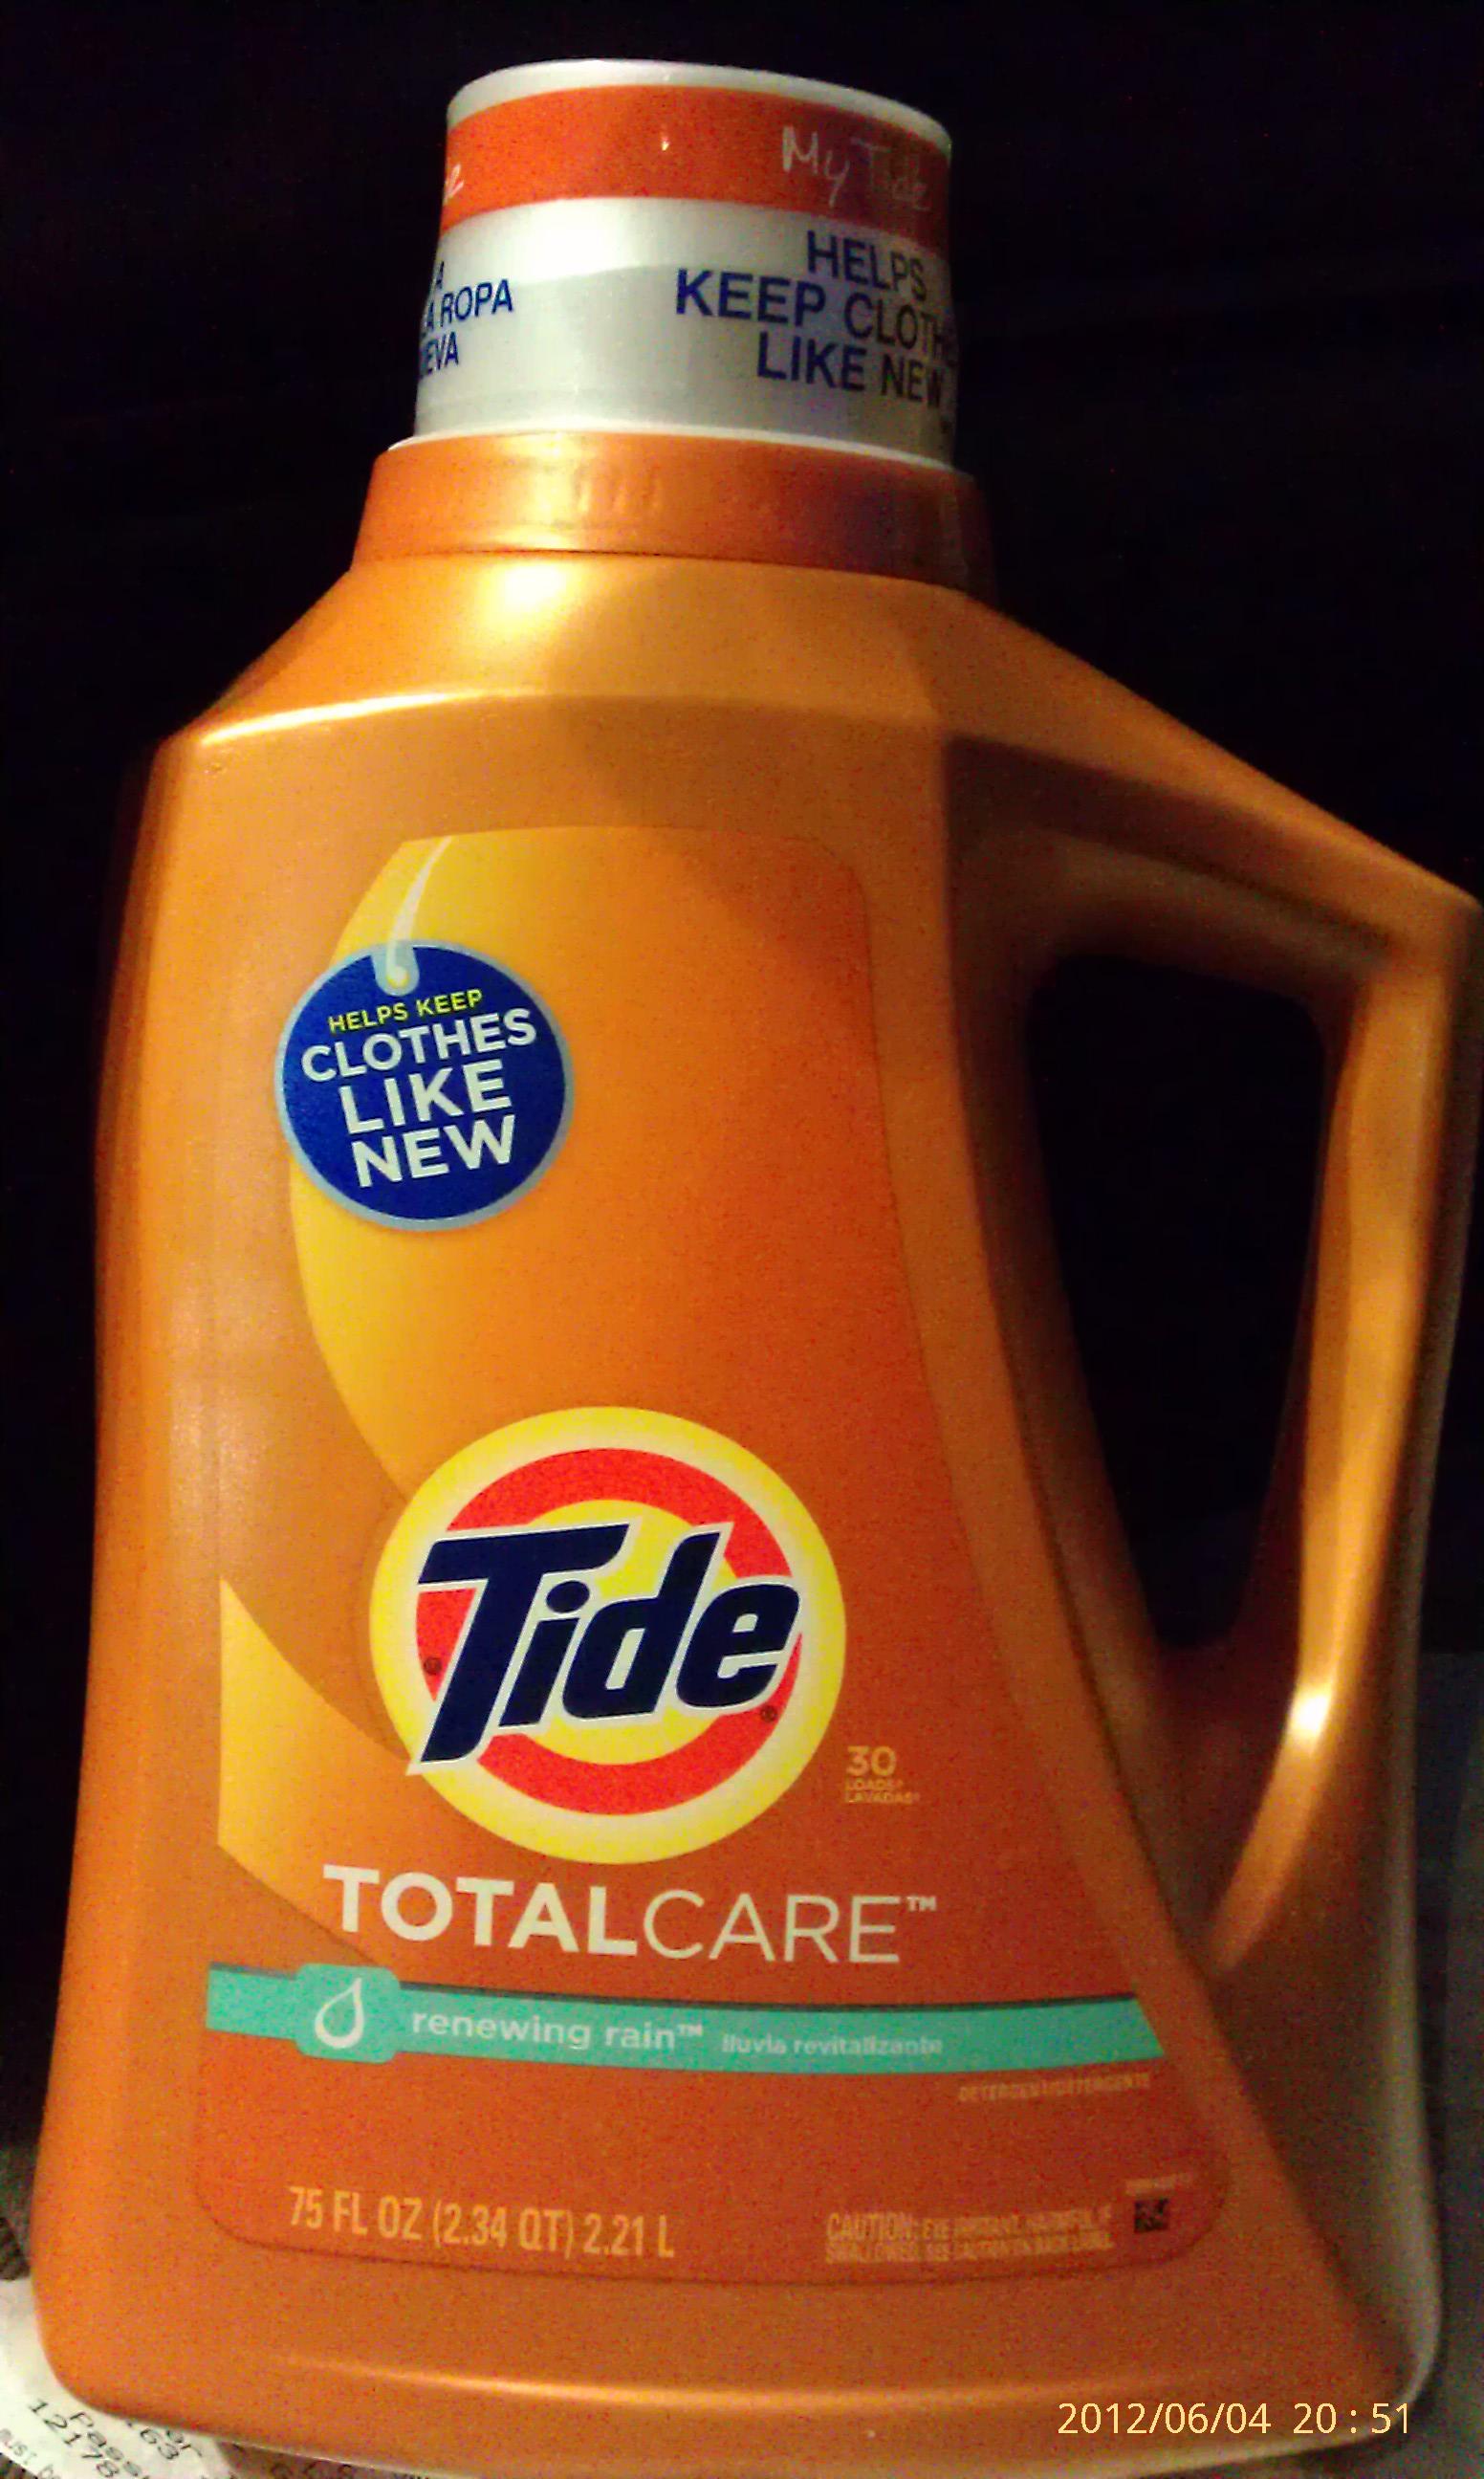 Tide Totalcare Liquid Detergent 75 oz for $2.63 @ Lowes -YMMV